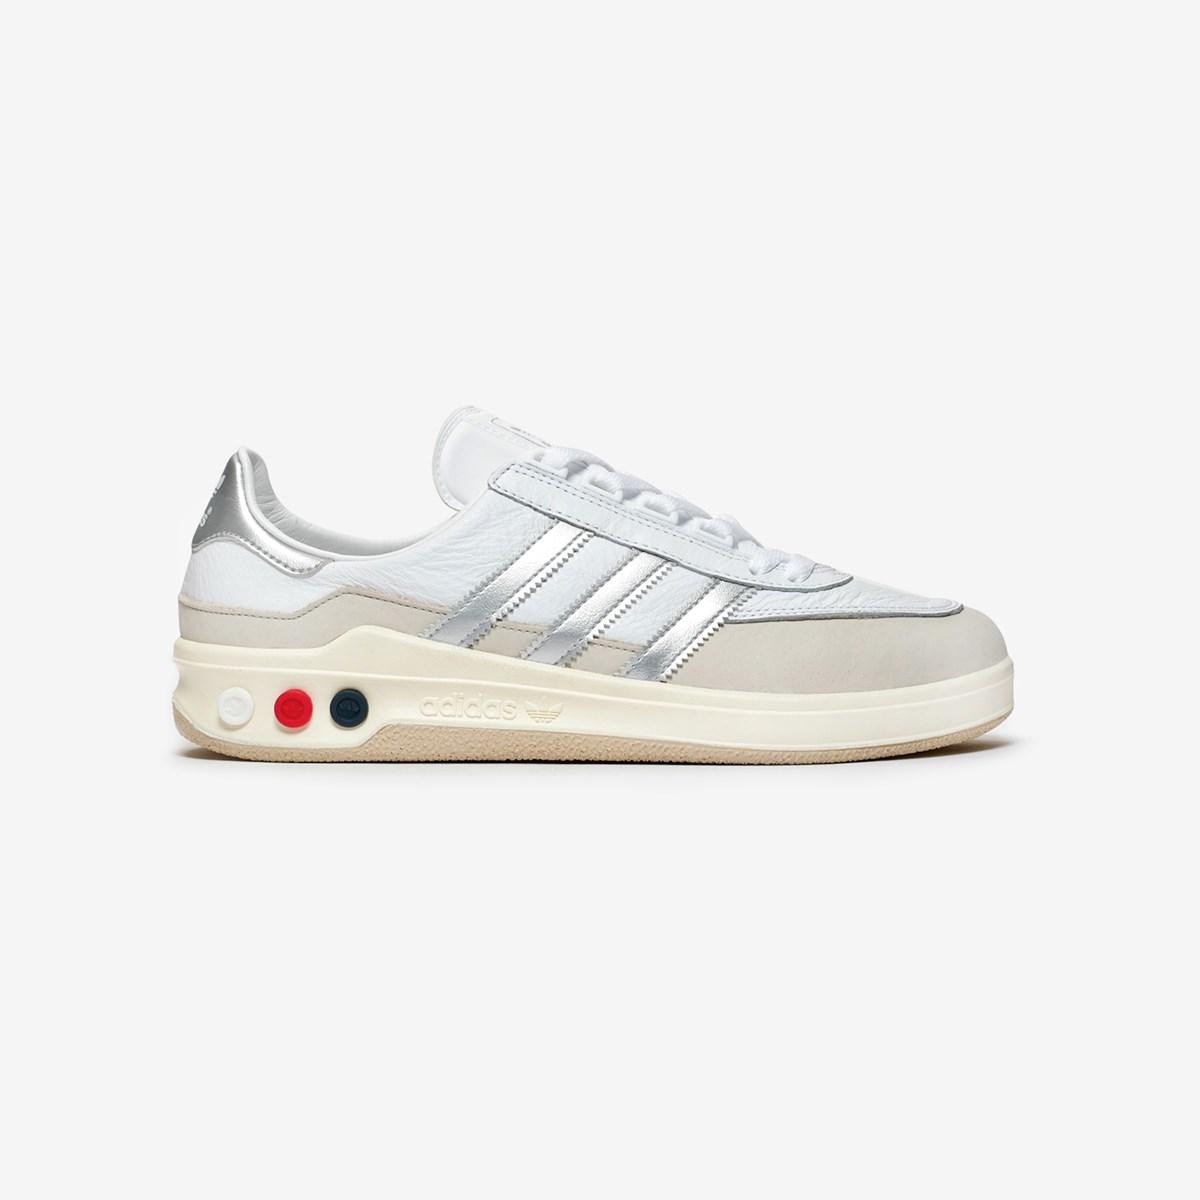 adidas GLXY SPZL - F35662 - Sneakersnstuff | sneakers \u0026 streetwear